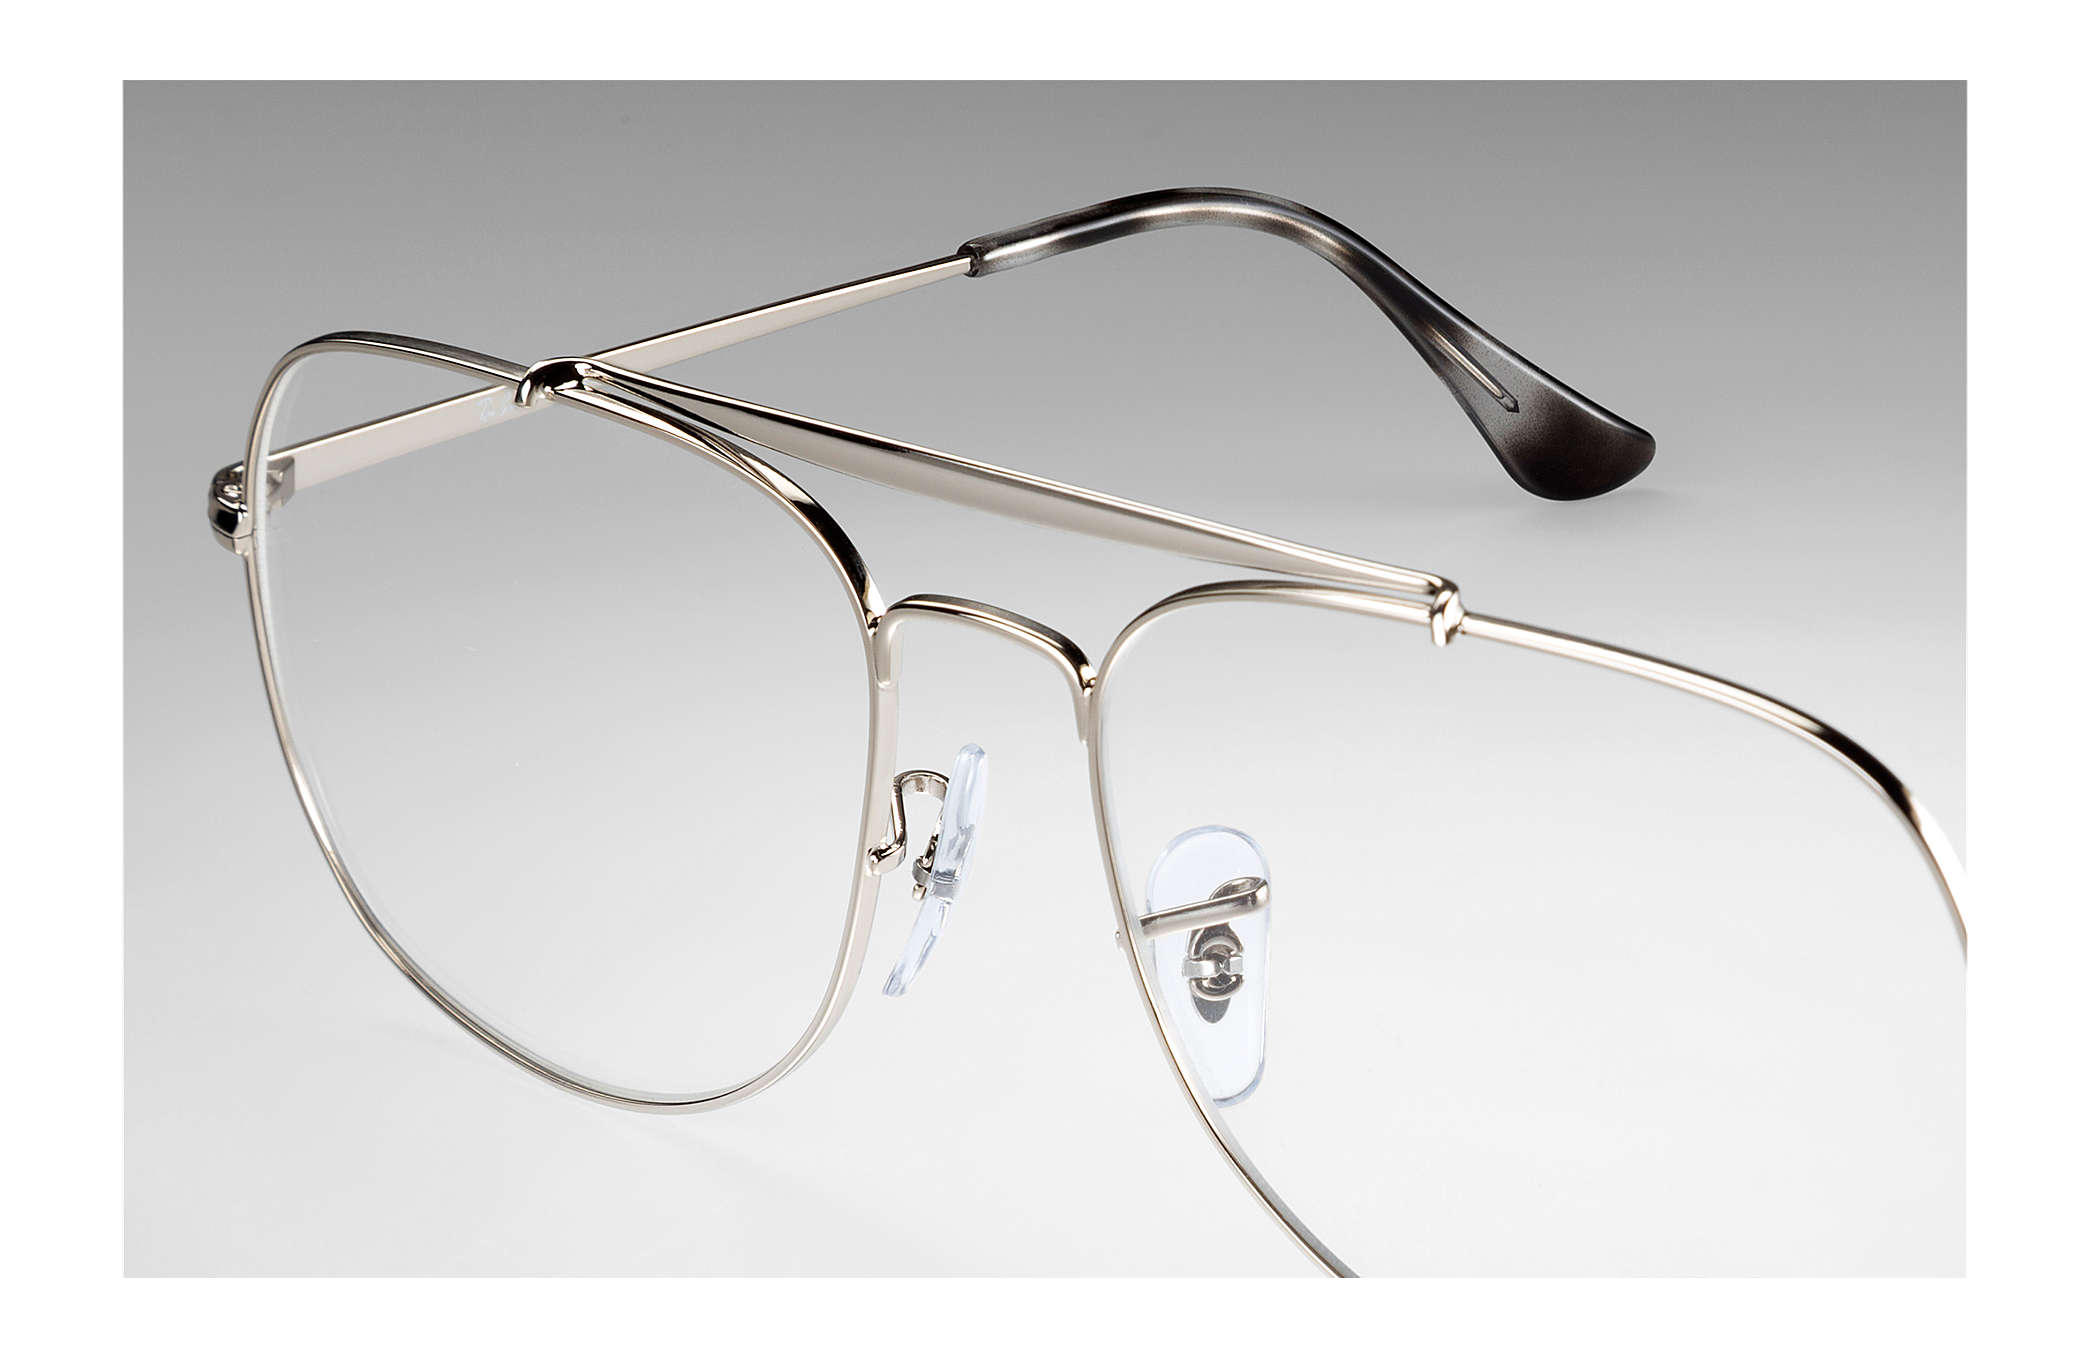 e39e018a8f5 Ray-Ban eyeglasses General Optics RB6389 Silver - Metal ...